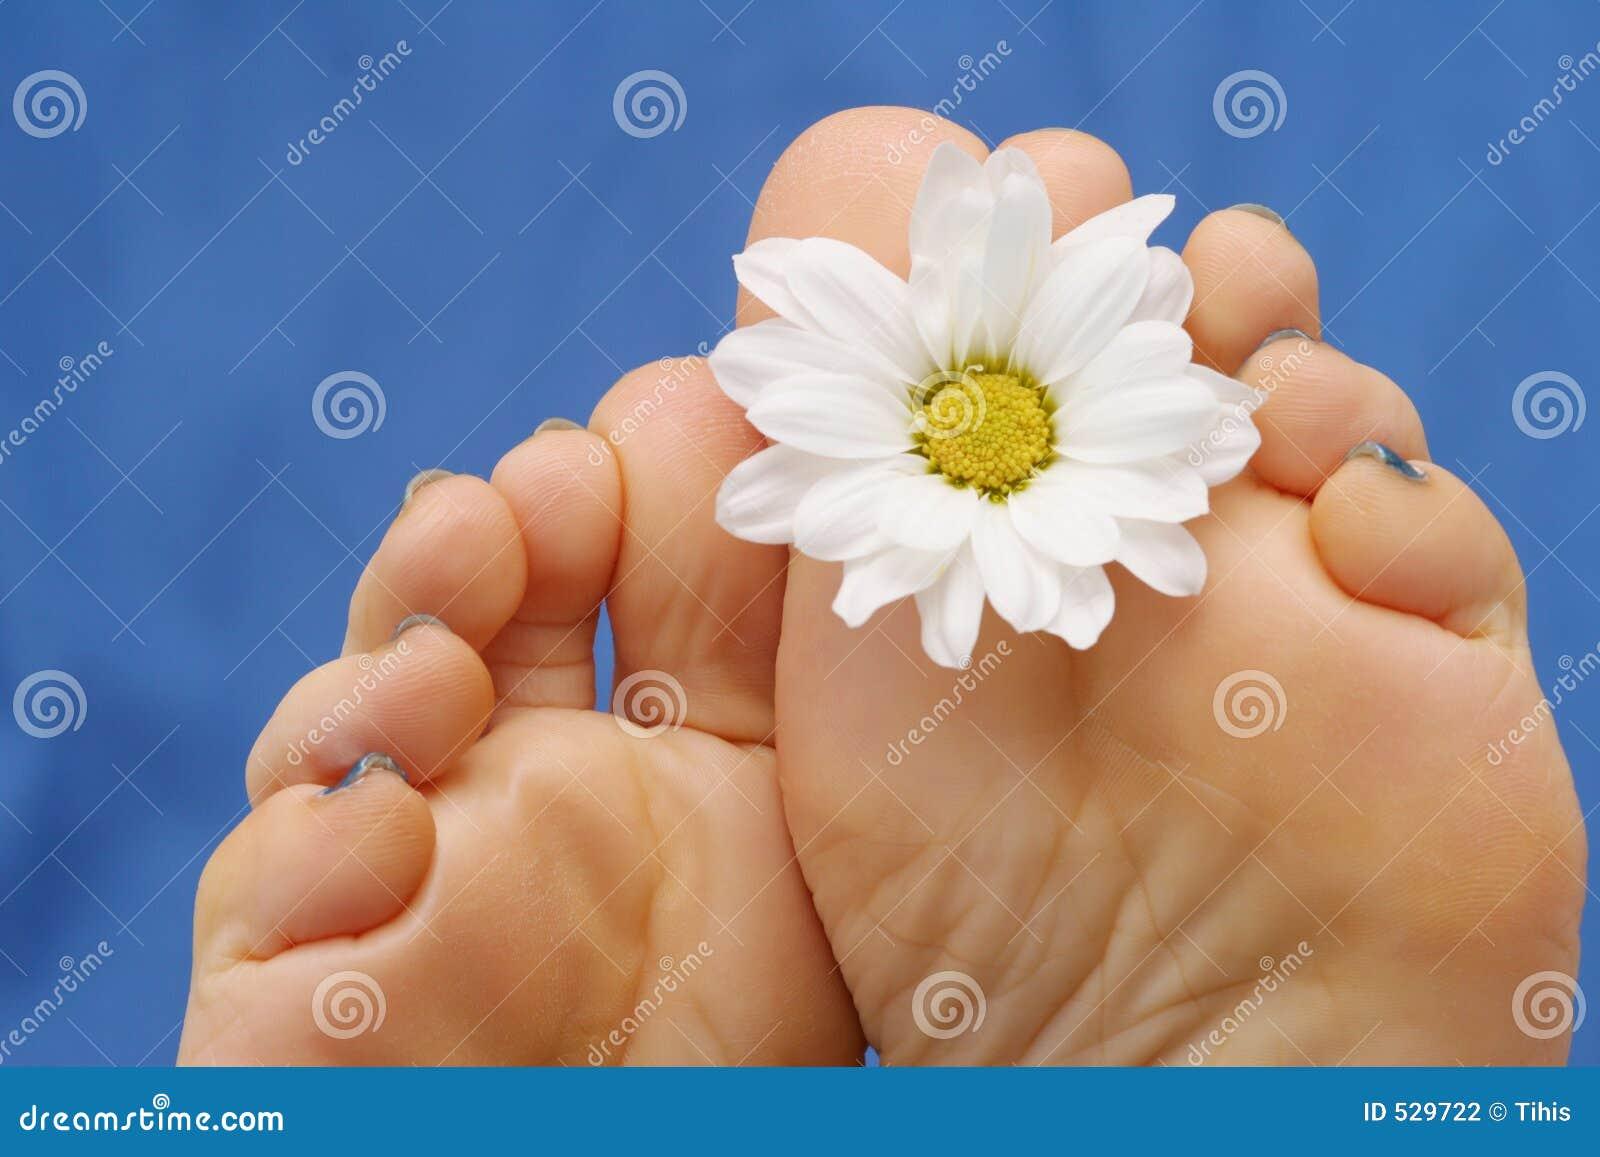 Download 英尺 库存照片. 图片 包括有 关心, 蓝色, 脚趾, 新鲜, 关闭, beauvoir, 健康, 鞋底, 虚拟 - 529722